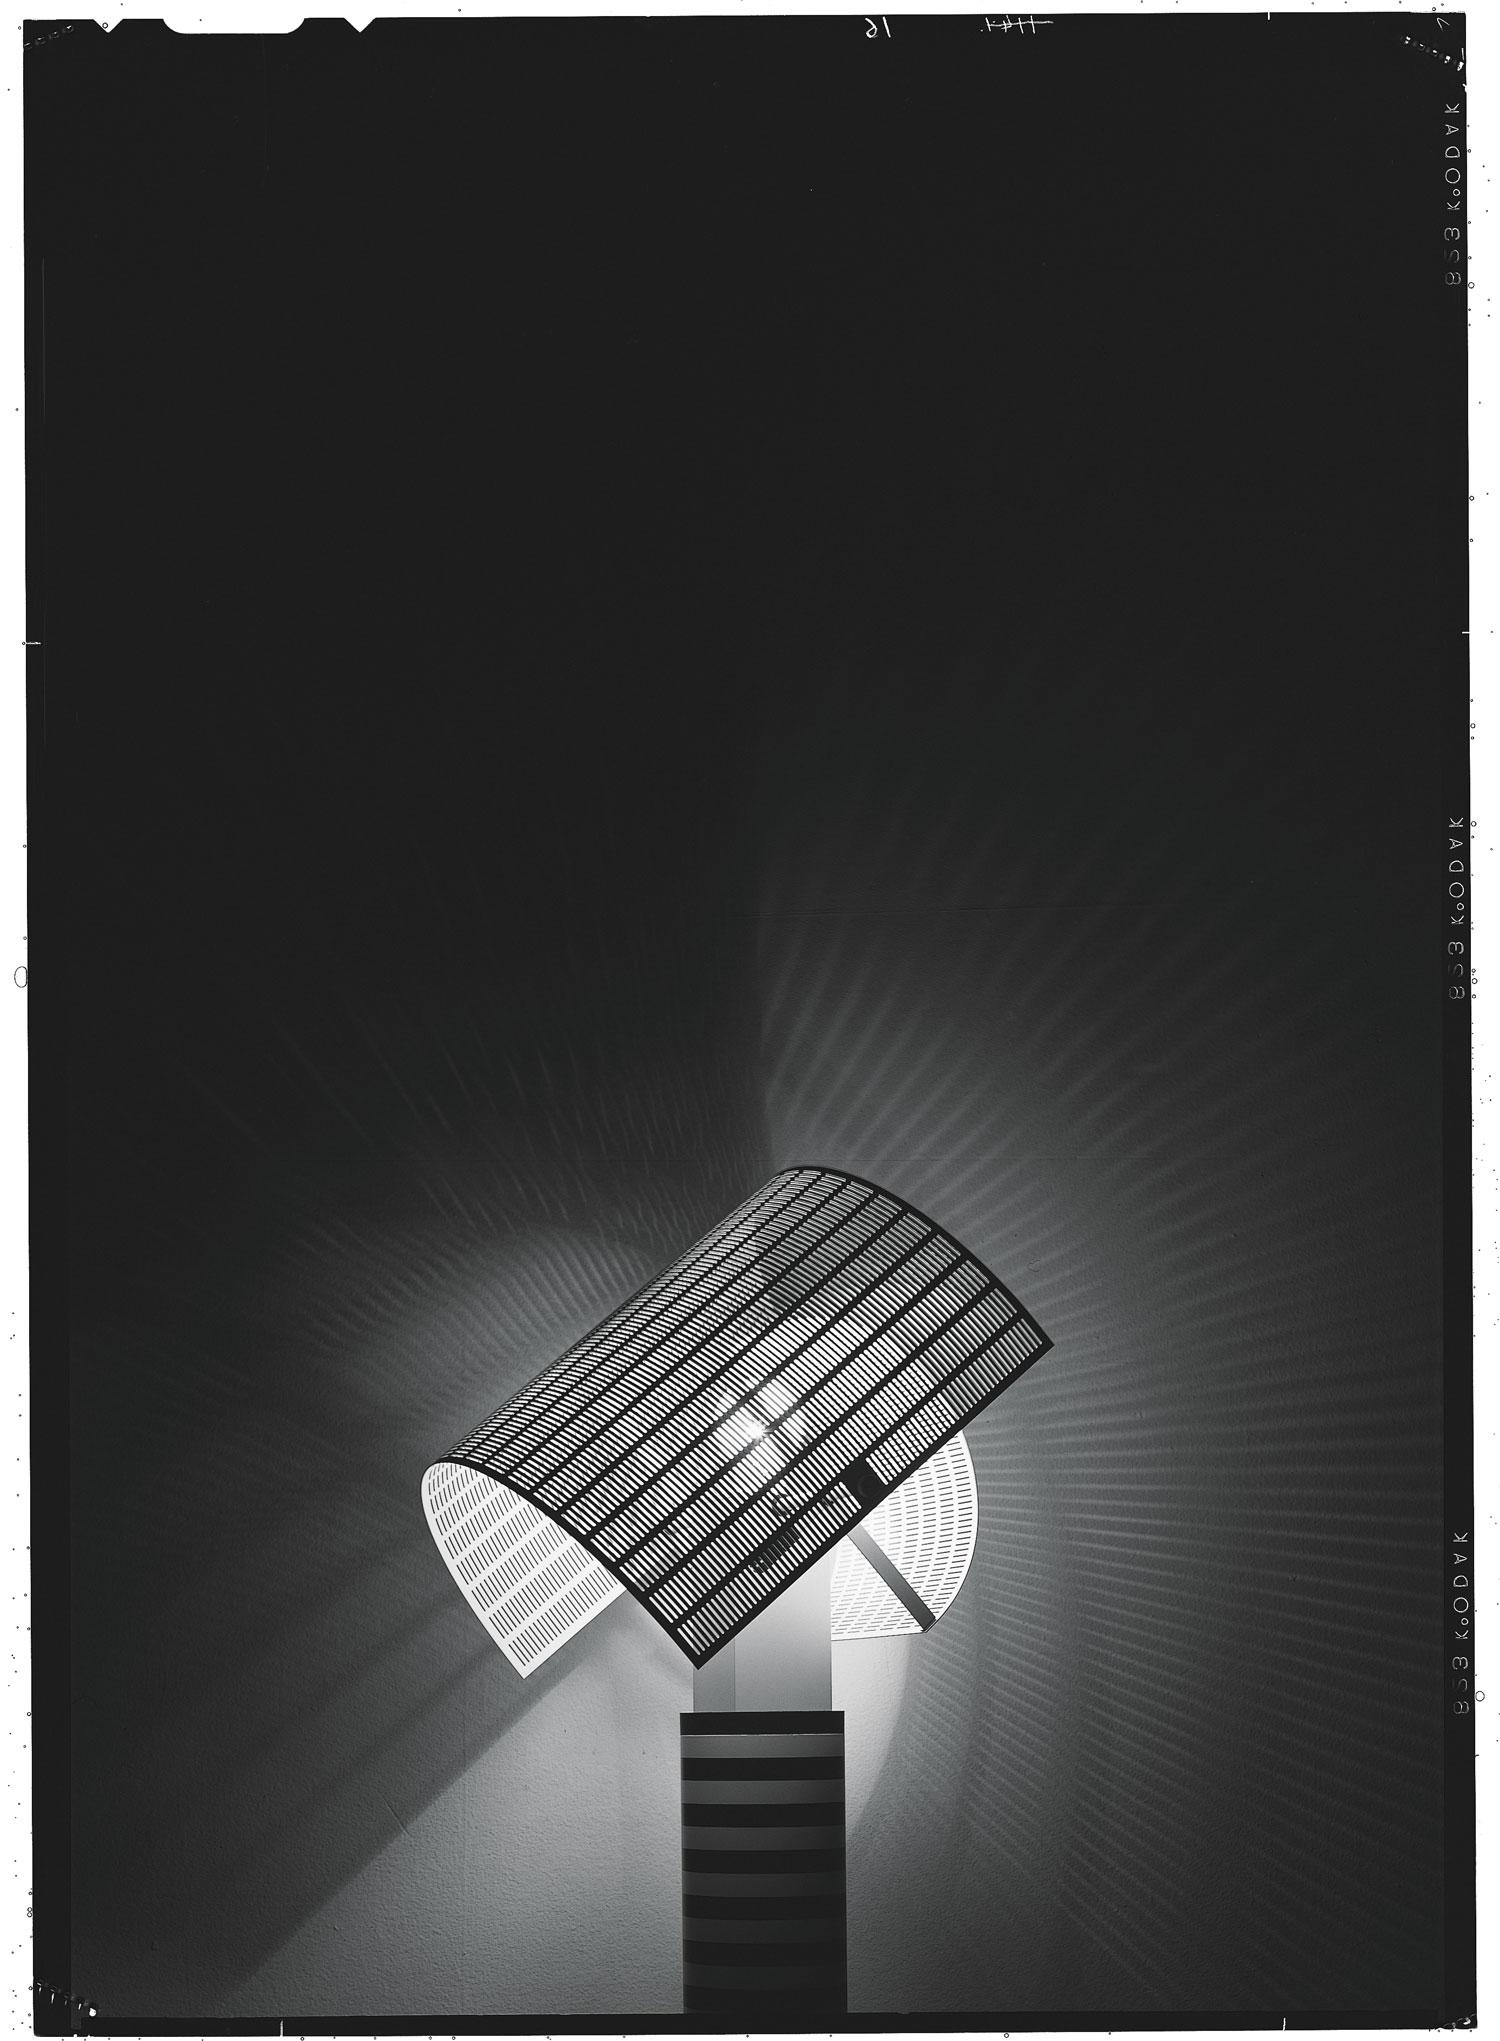 Artemide Shogun Table Lamp Yellowtrace